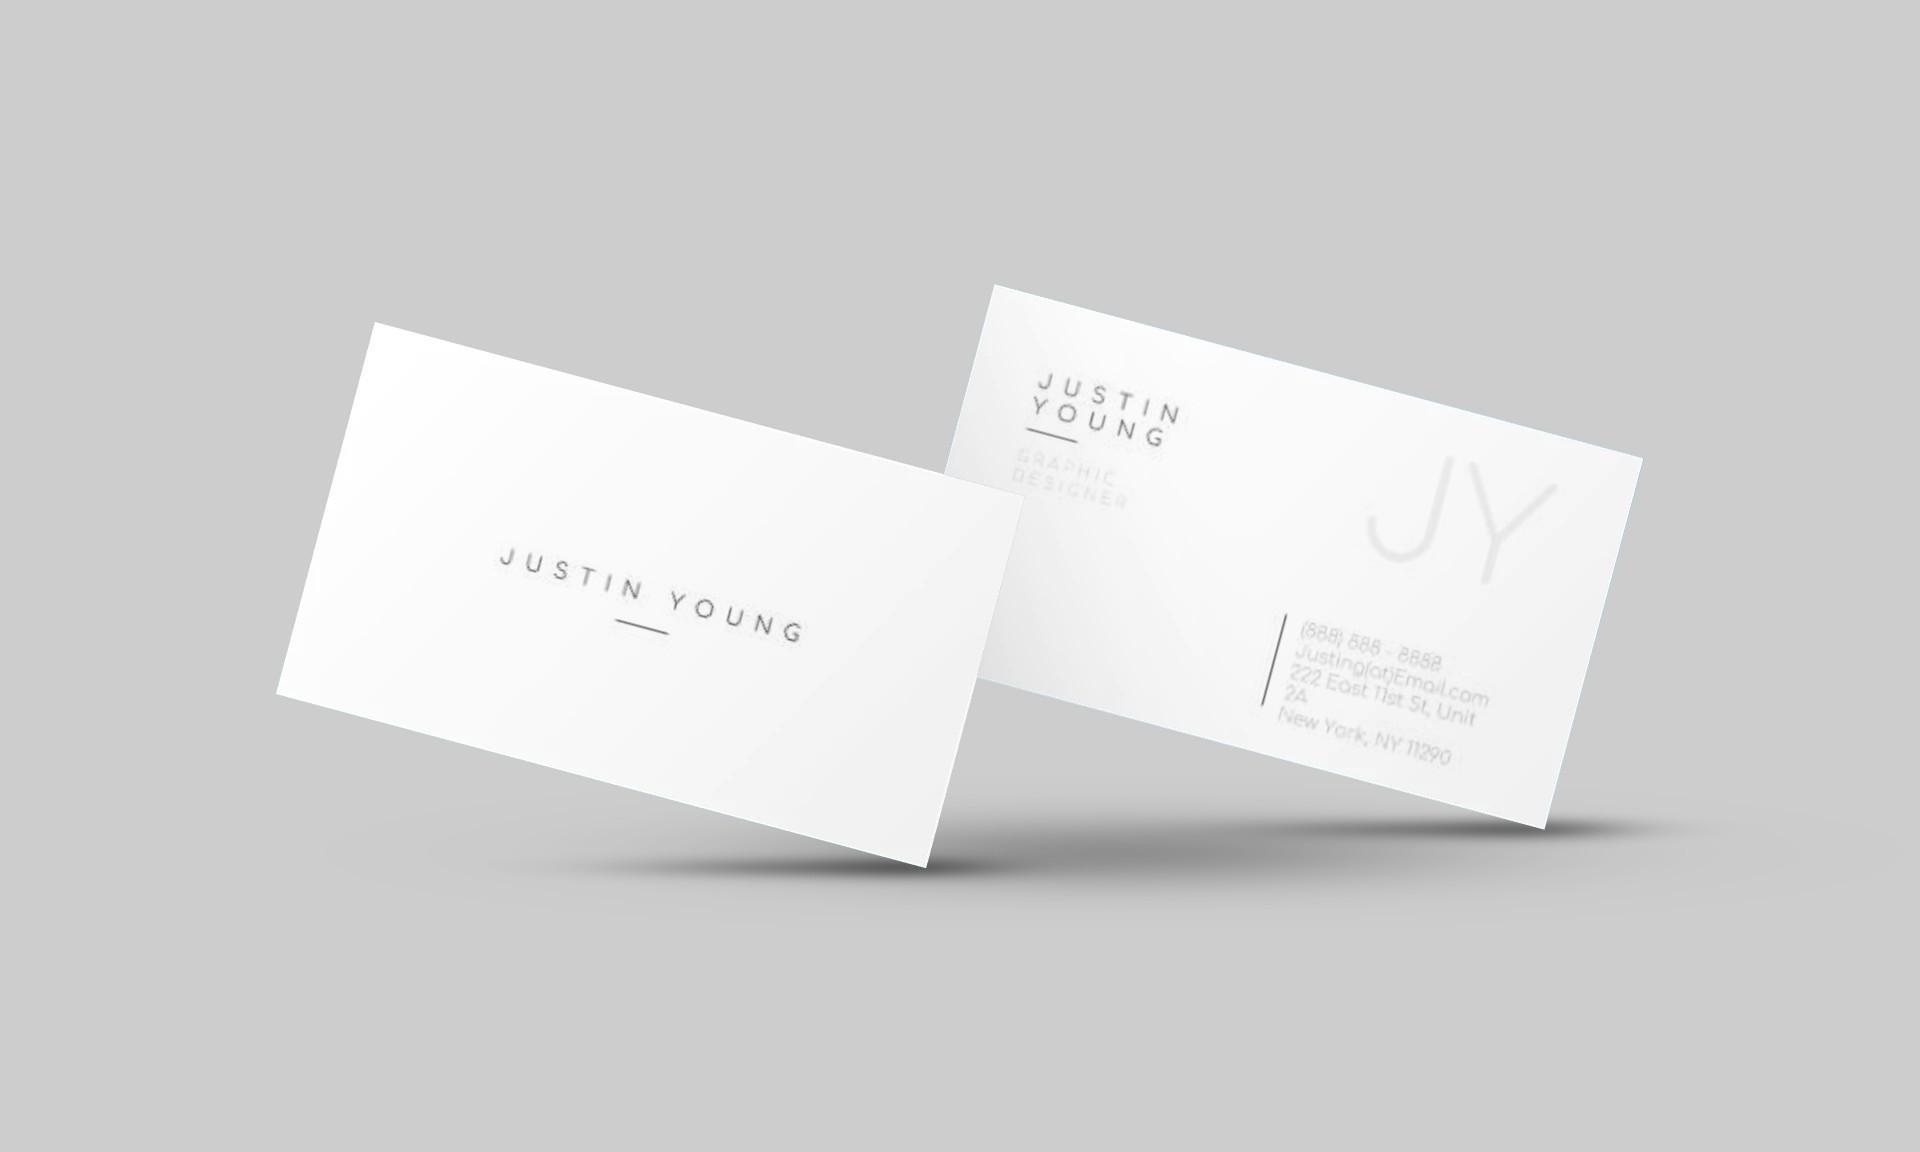 Justin Young Google Docs Business Card Template